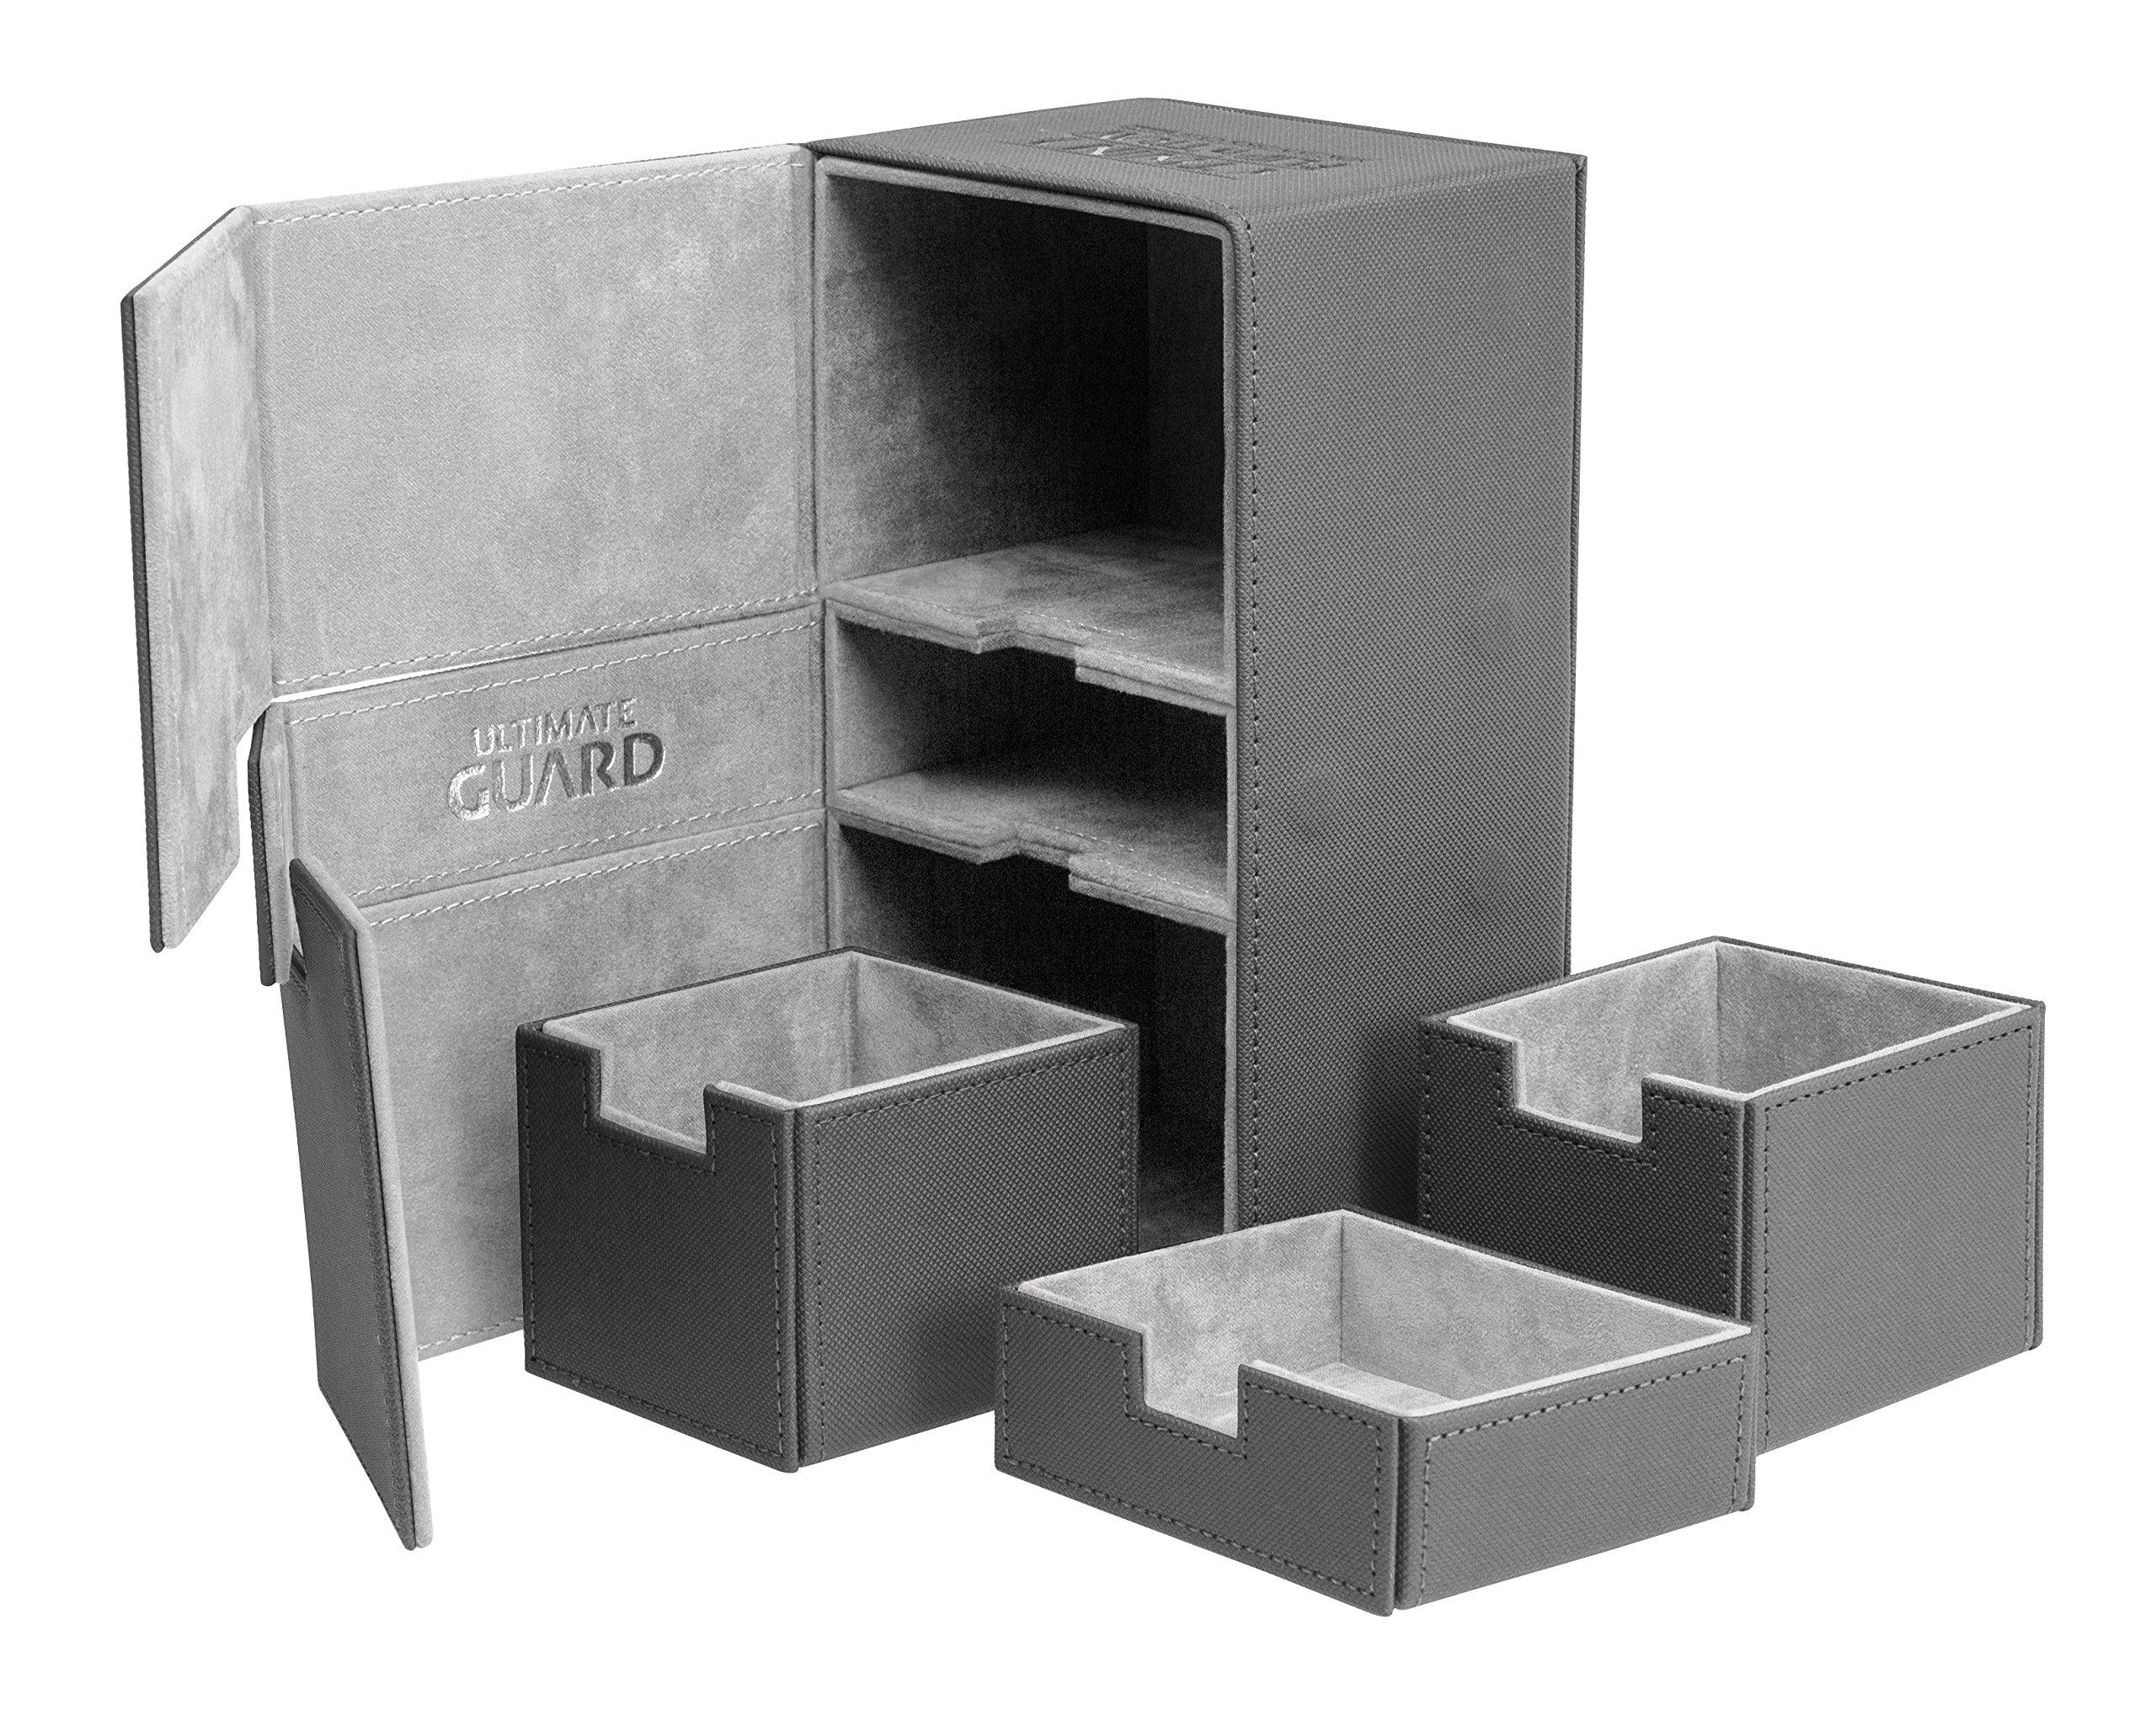 Ultimate Guard 200 Card Twin Flip N Tray Xenoskin Deck Case, Grey